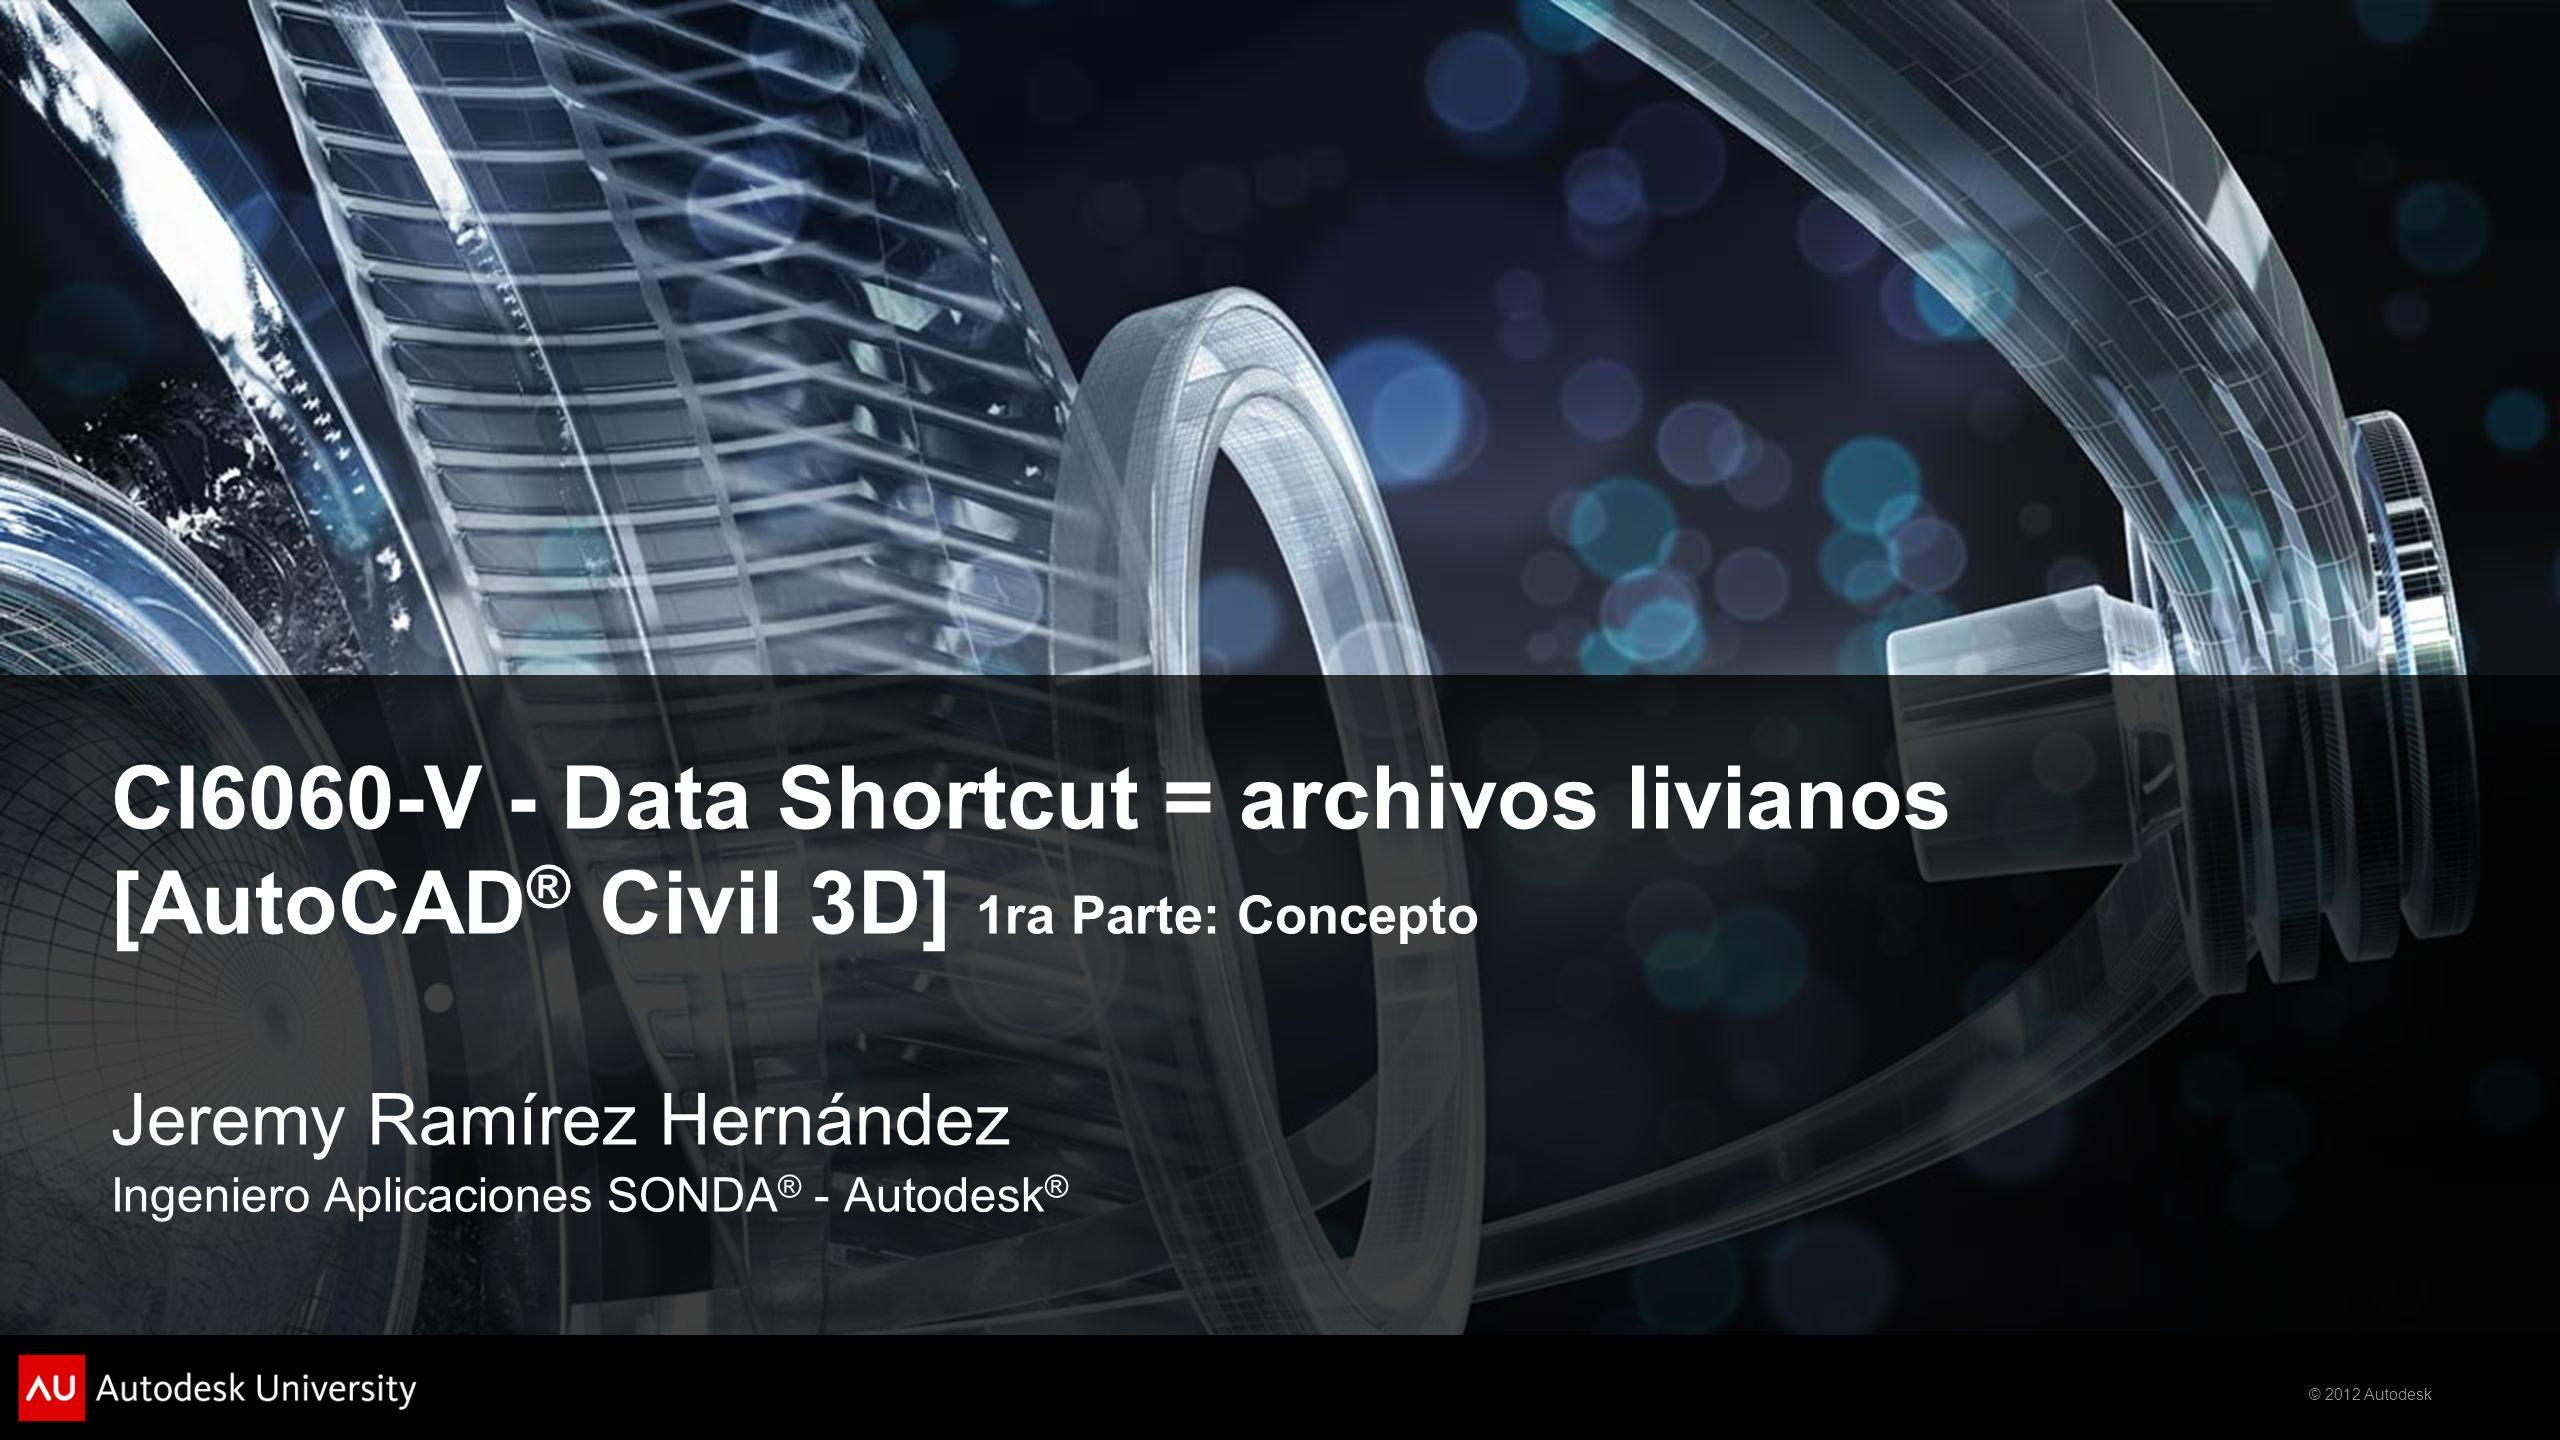 © 2012 Autodesk CI6060-V - Data Shortcut = archivos livianos [AutoCAD ® Civil 3D] 1ra Parte: Concepto Jeremy Ramírez Hernández Ingeniero Aplicaciones